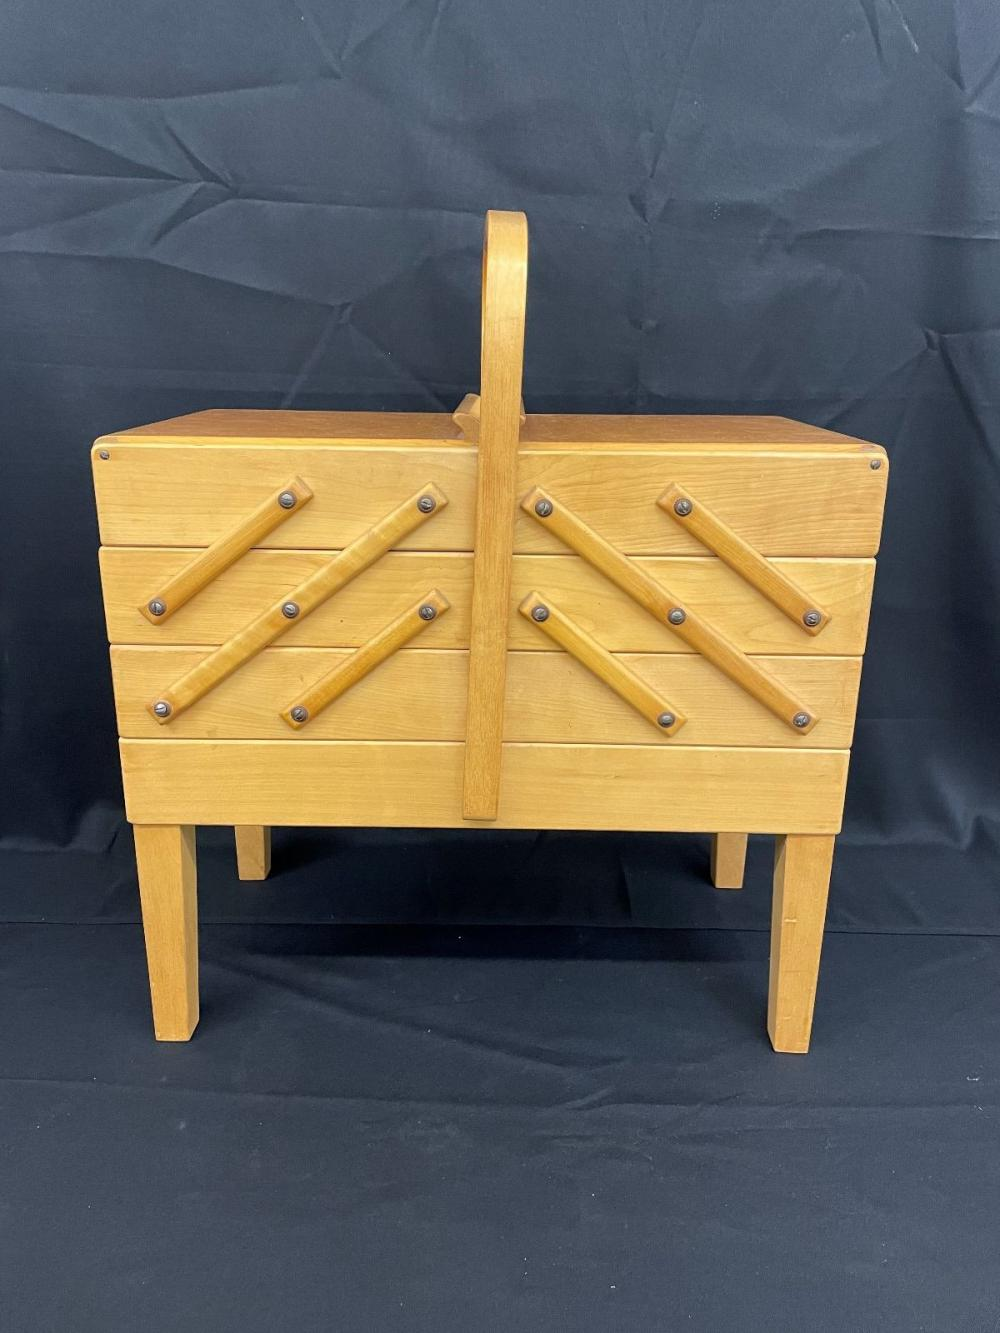 Strommen Bruk Hamar Accordion Style Sewing Box